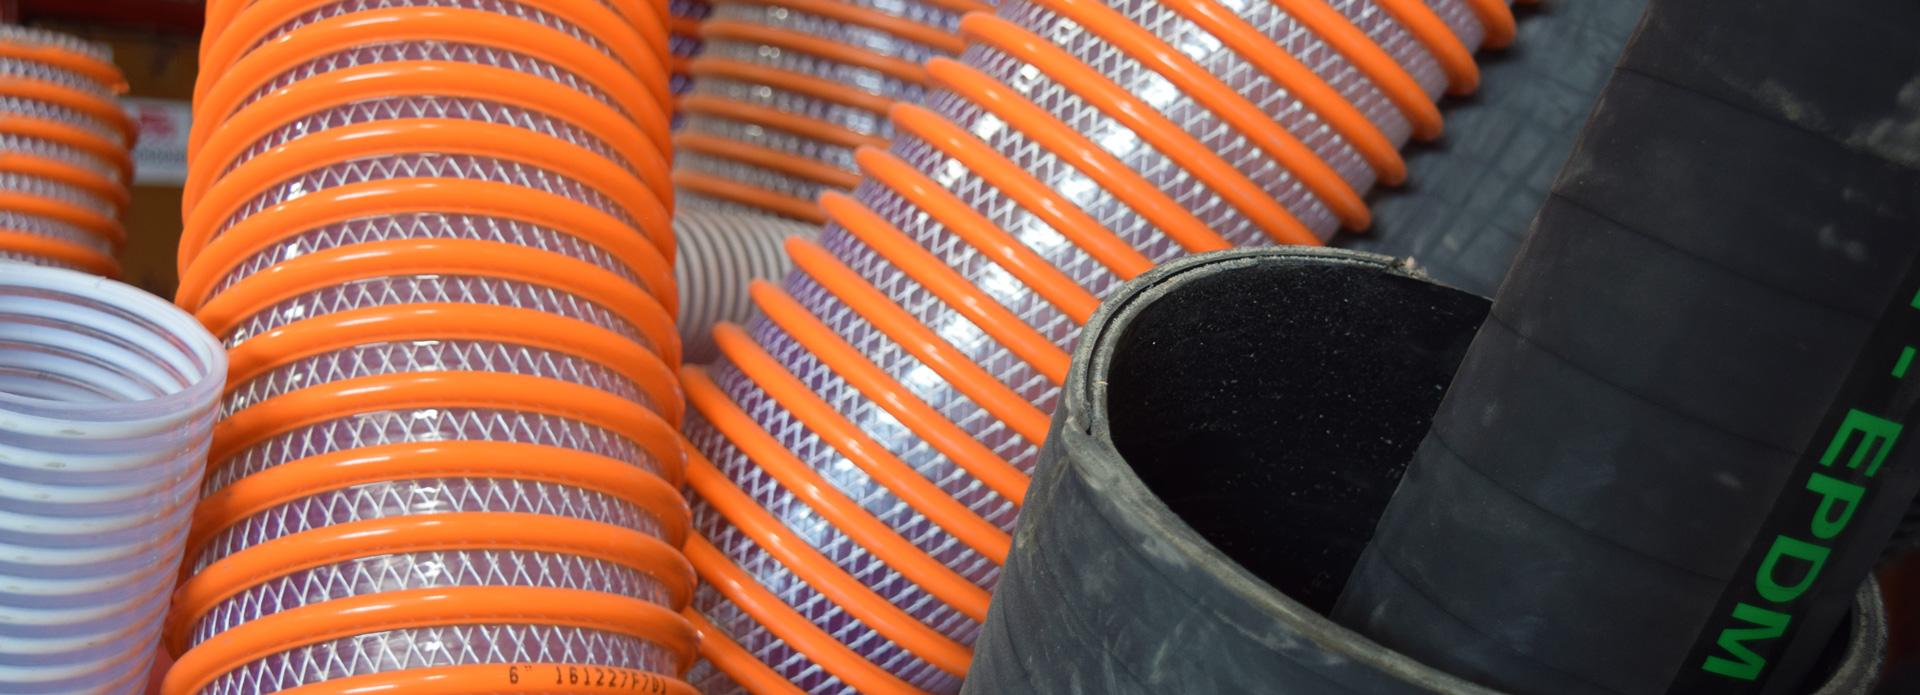 Eldon-C-Stutsman-Inc-Wholesale-Hose-orange-suction-EPDM-